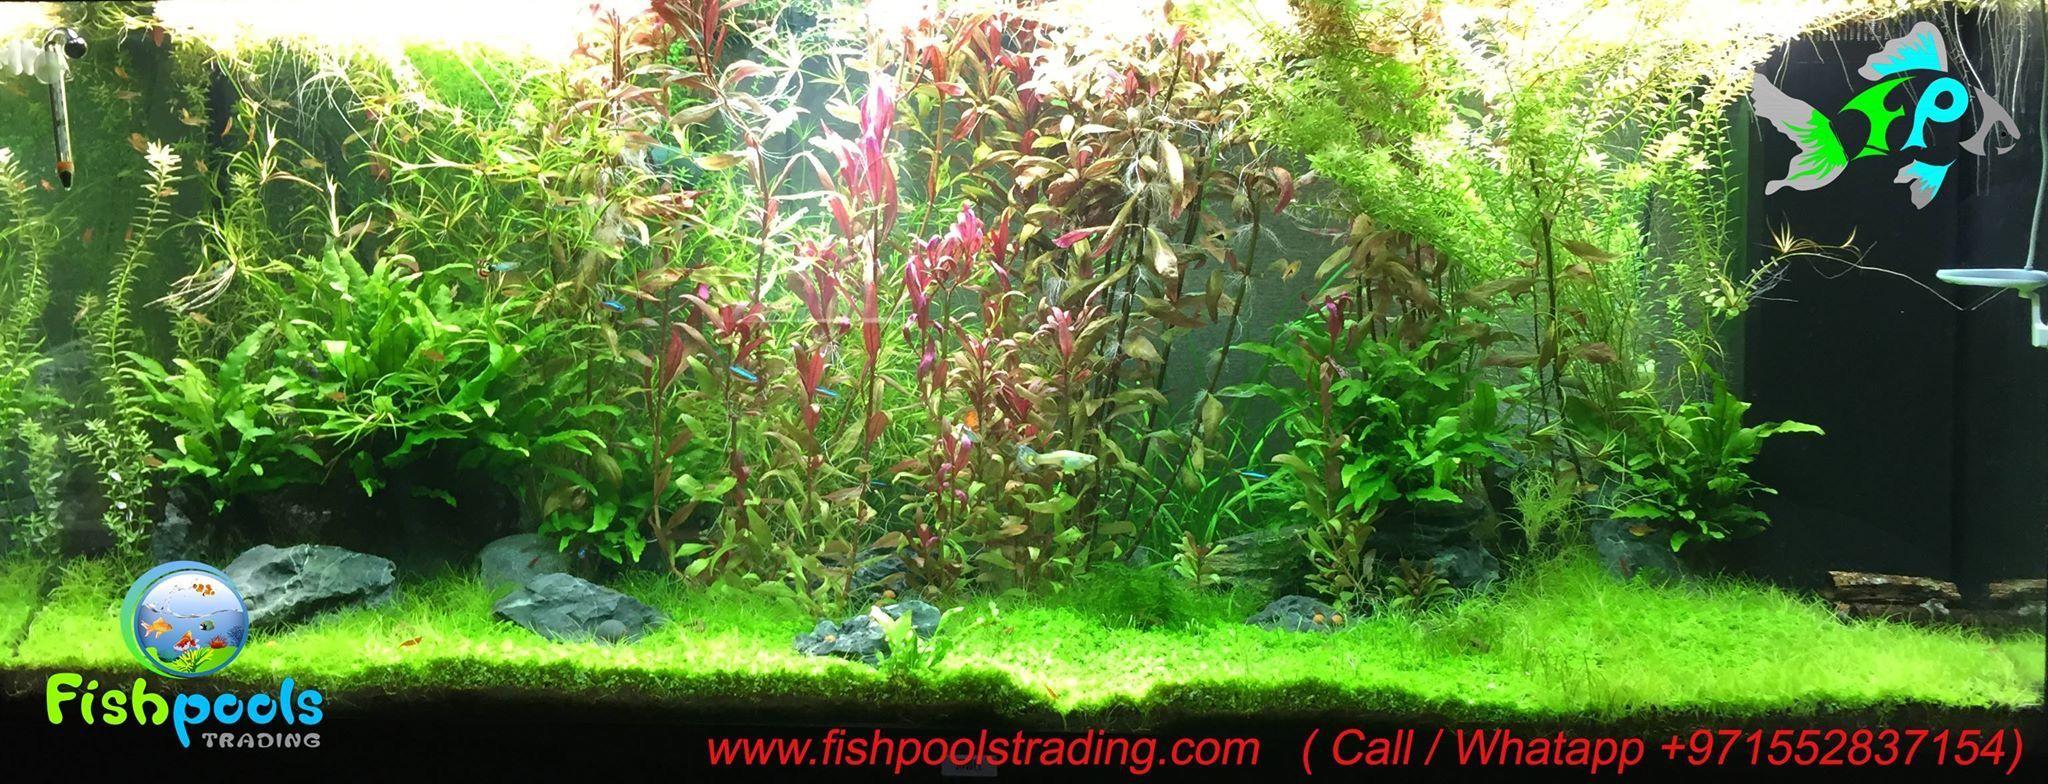 Pin by Fish Pools Trading LLC on Aquascaping UAE